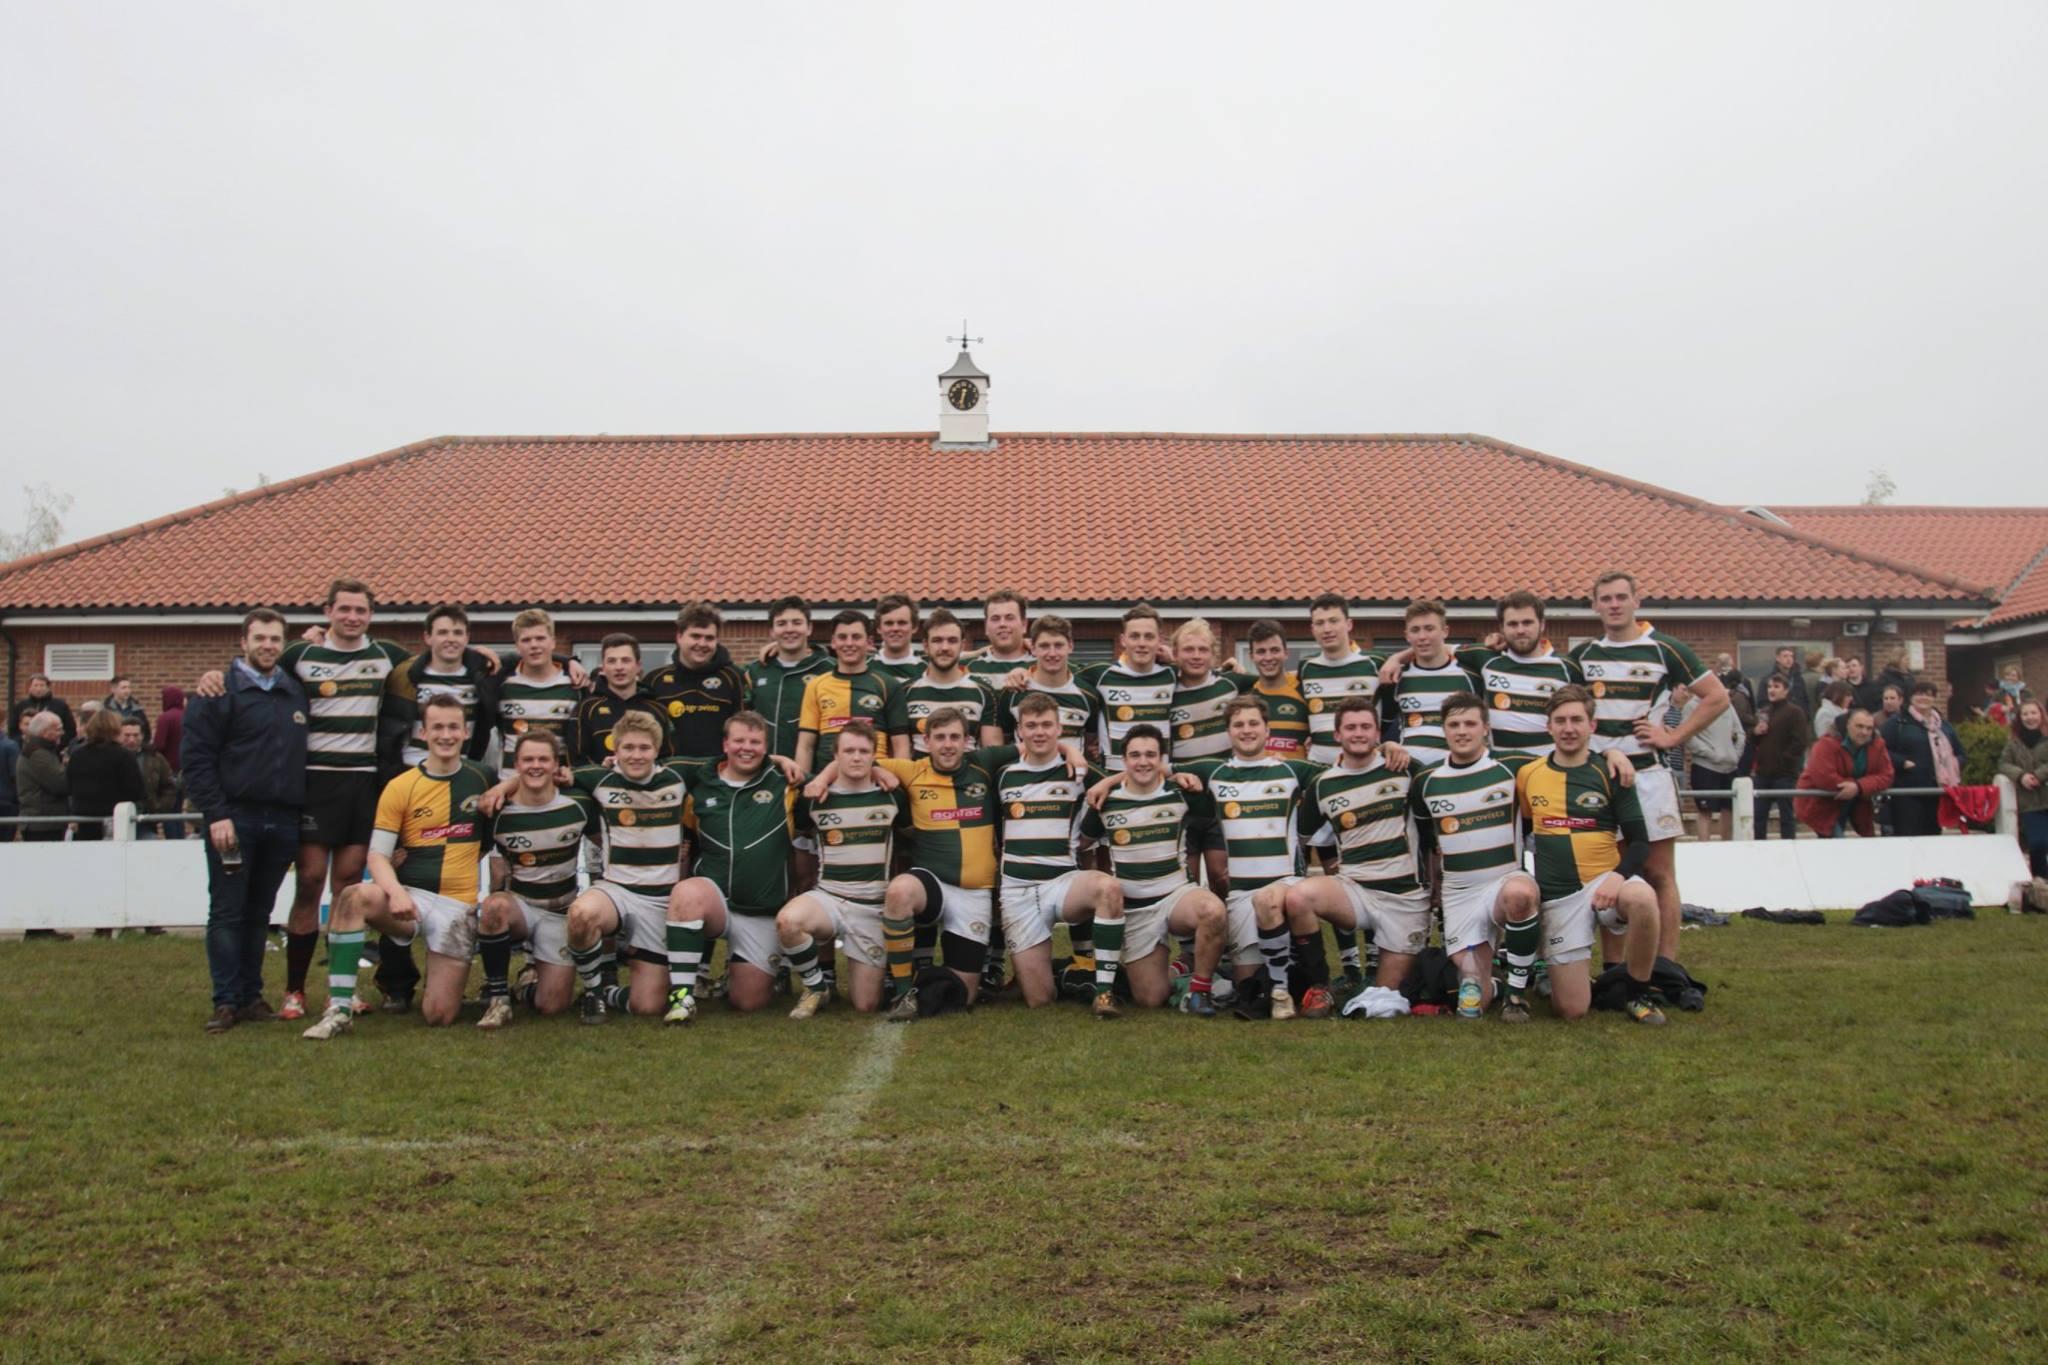 Malton v Agrics 2016